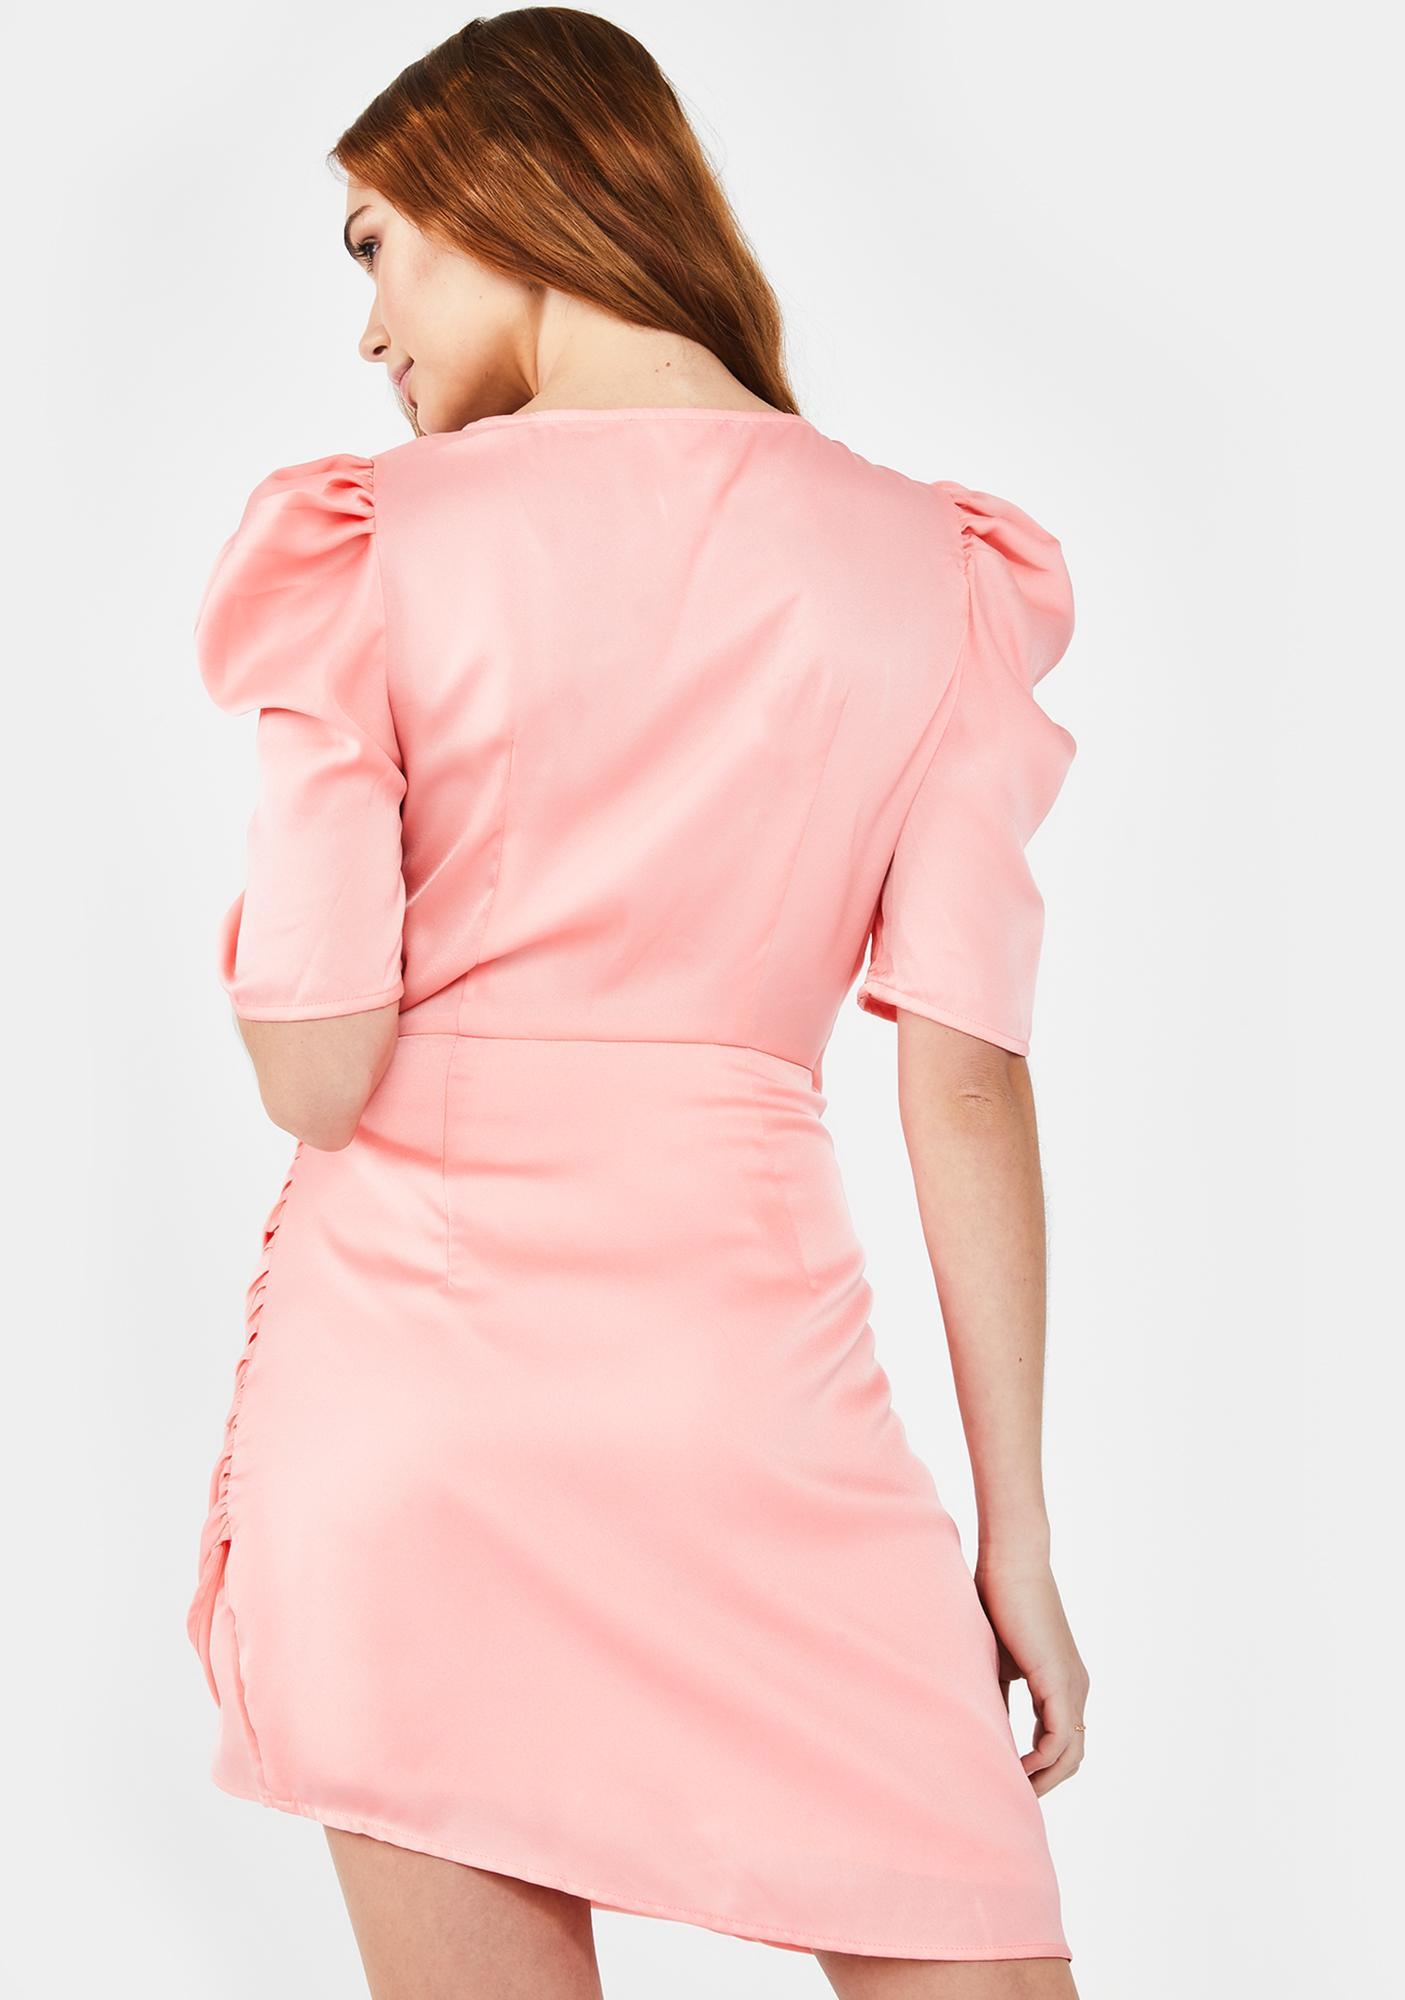 Glamorous Peach Satin Wrap Dress